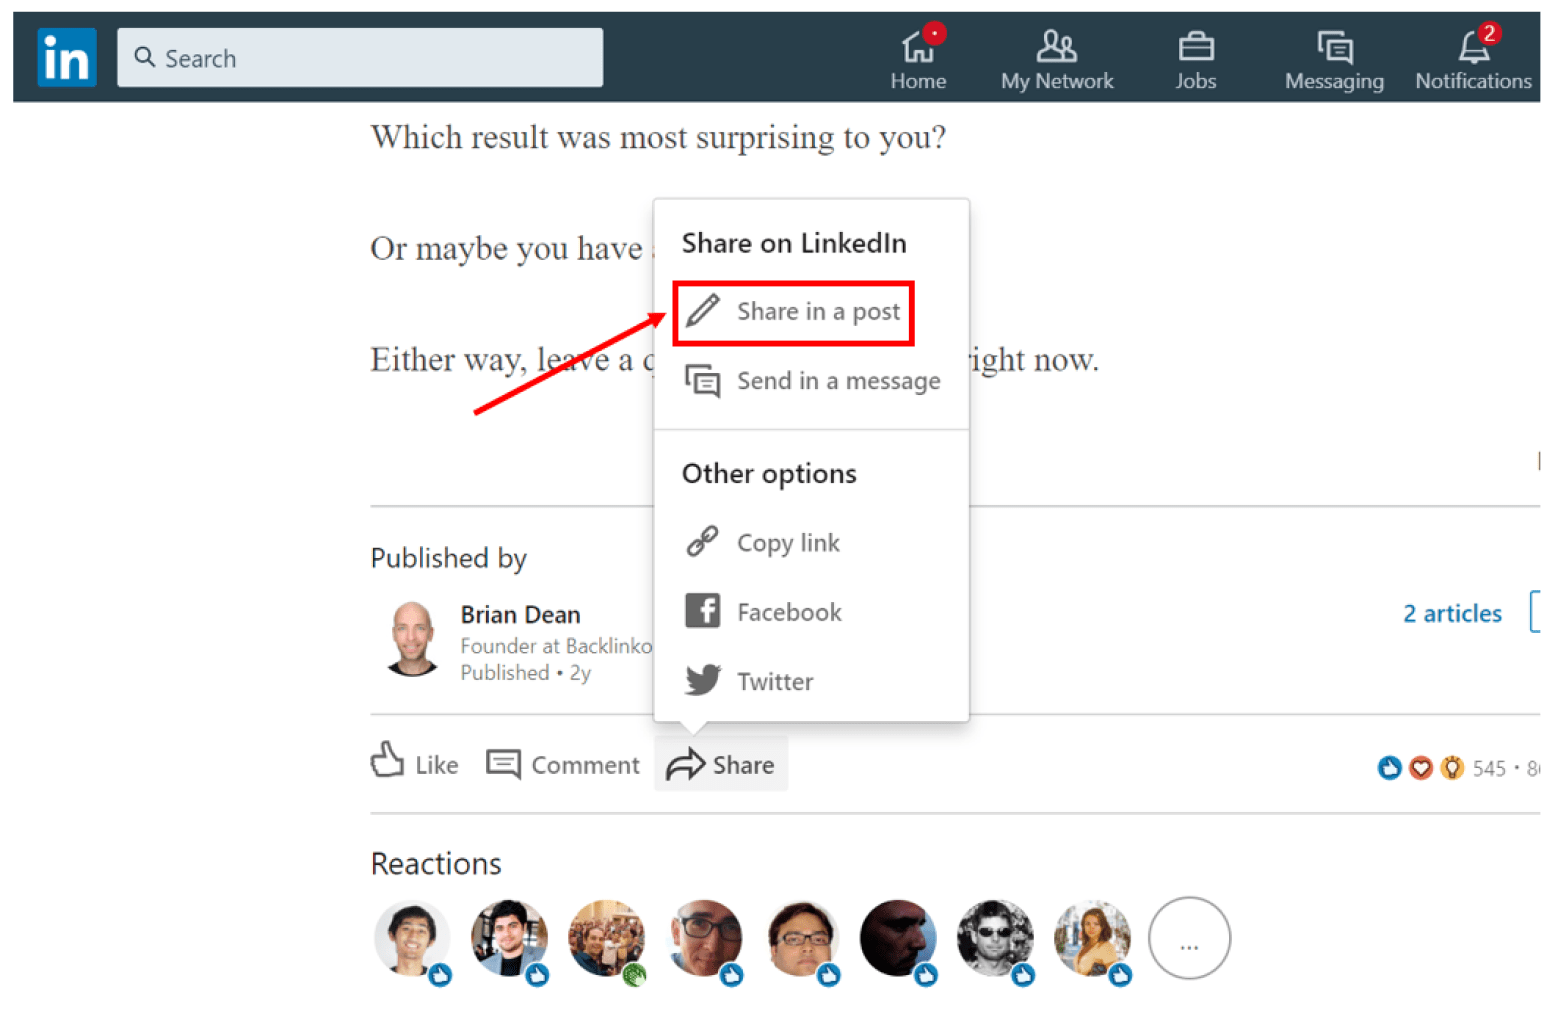 Brian Dean LinkedIn posts